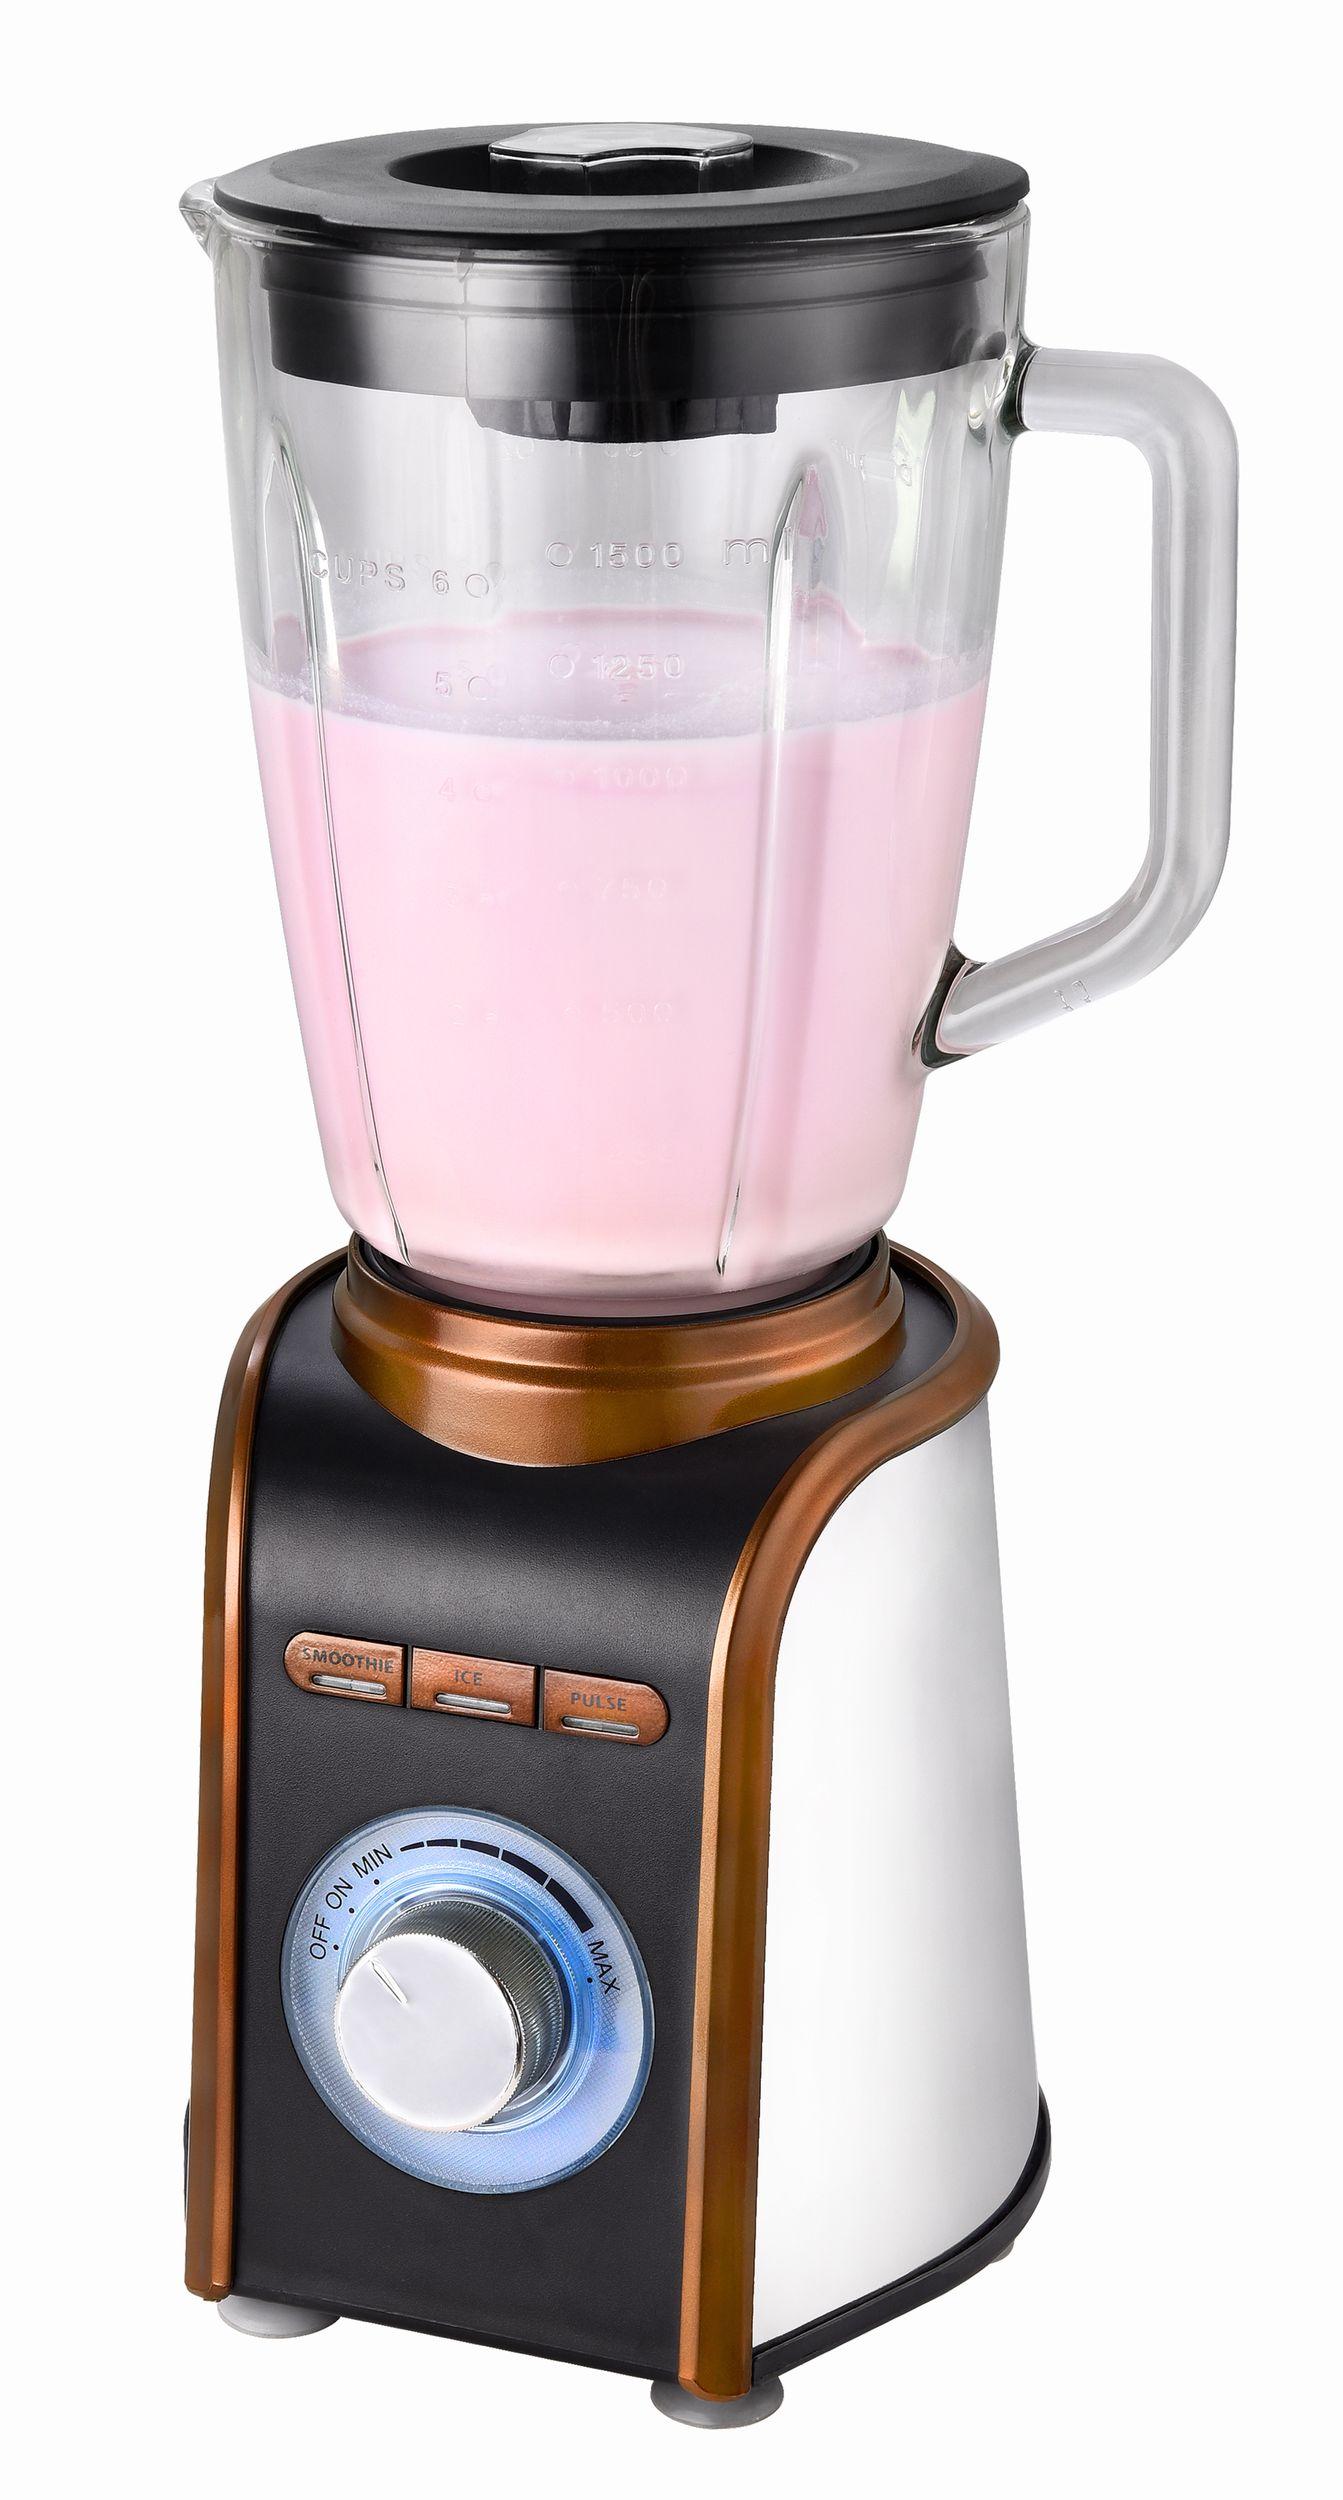 Standmixer Blender Smoothiemaker Cocktailmixer Glaskrug Eis Crusher 1,5 Liter 700 W NEU*94227 Bild 2